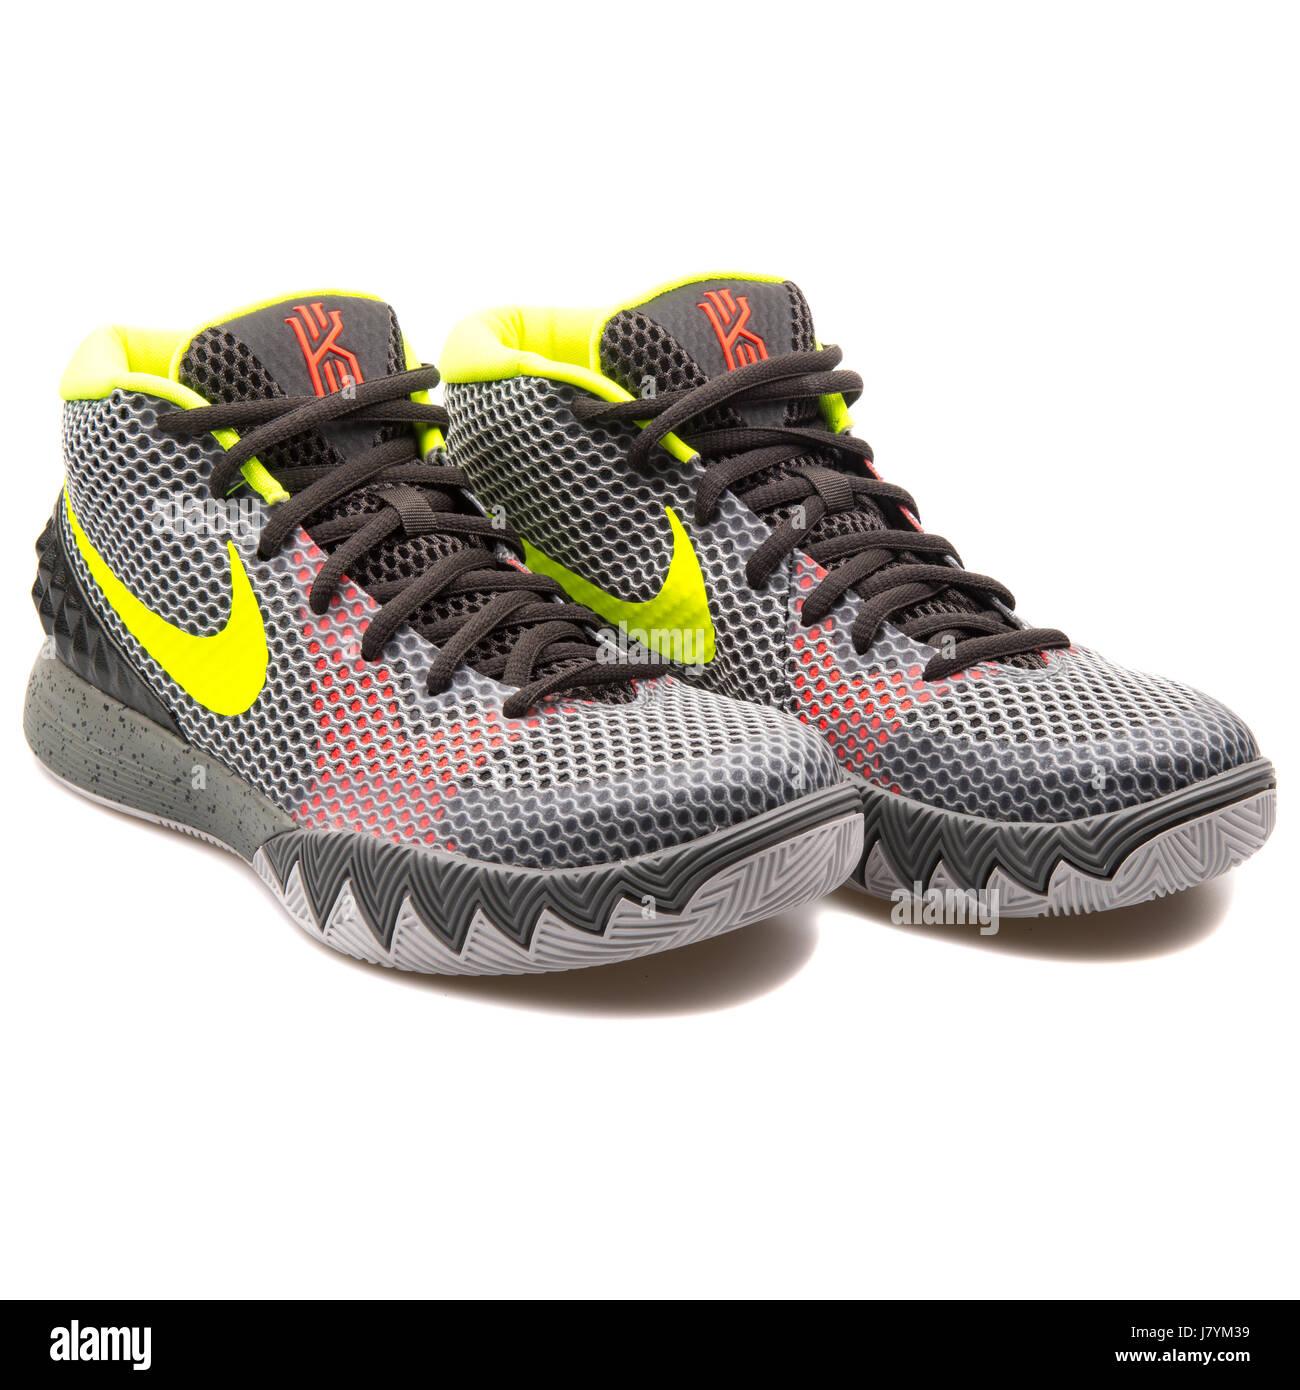 premium selection ab3d2 aad6b Nike Kyrie 1 Uomo grigio Sneakers Basket - 705277-270 Immagini Stock